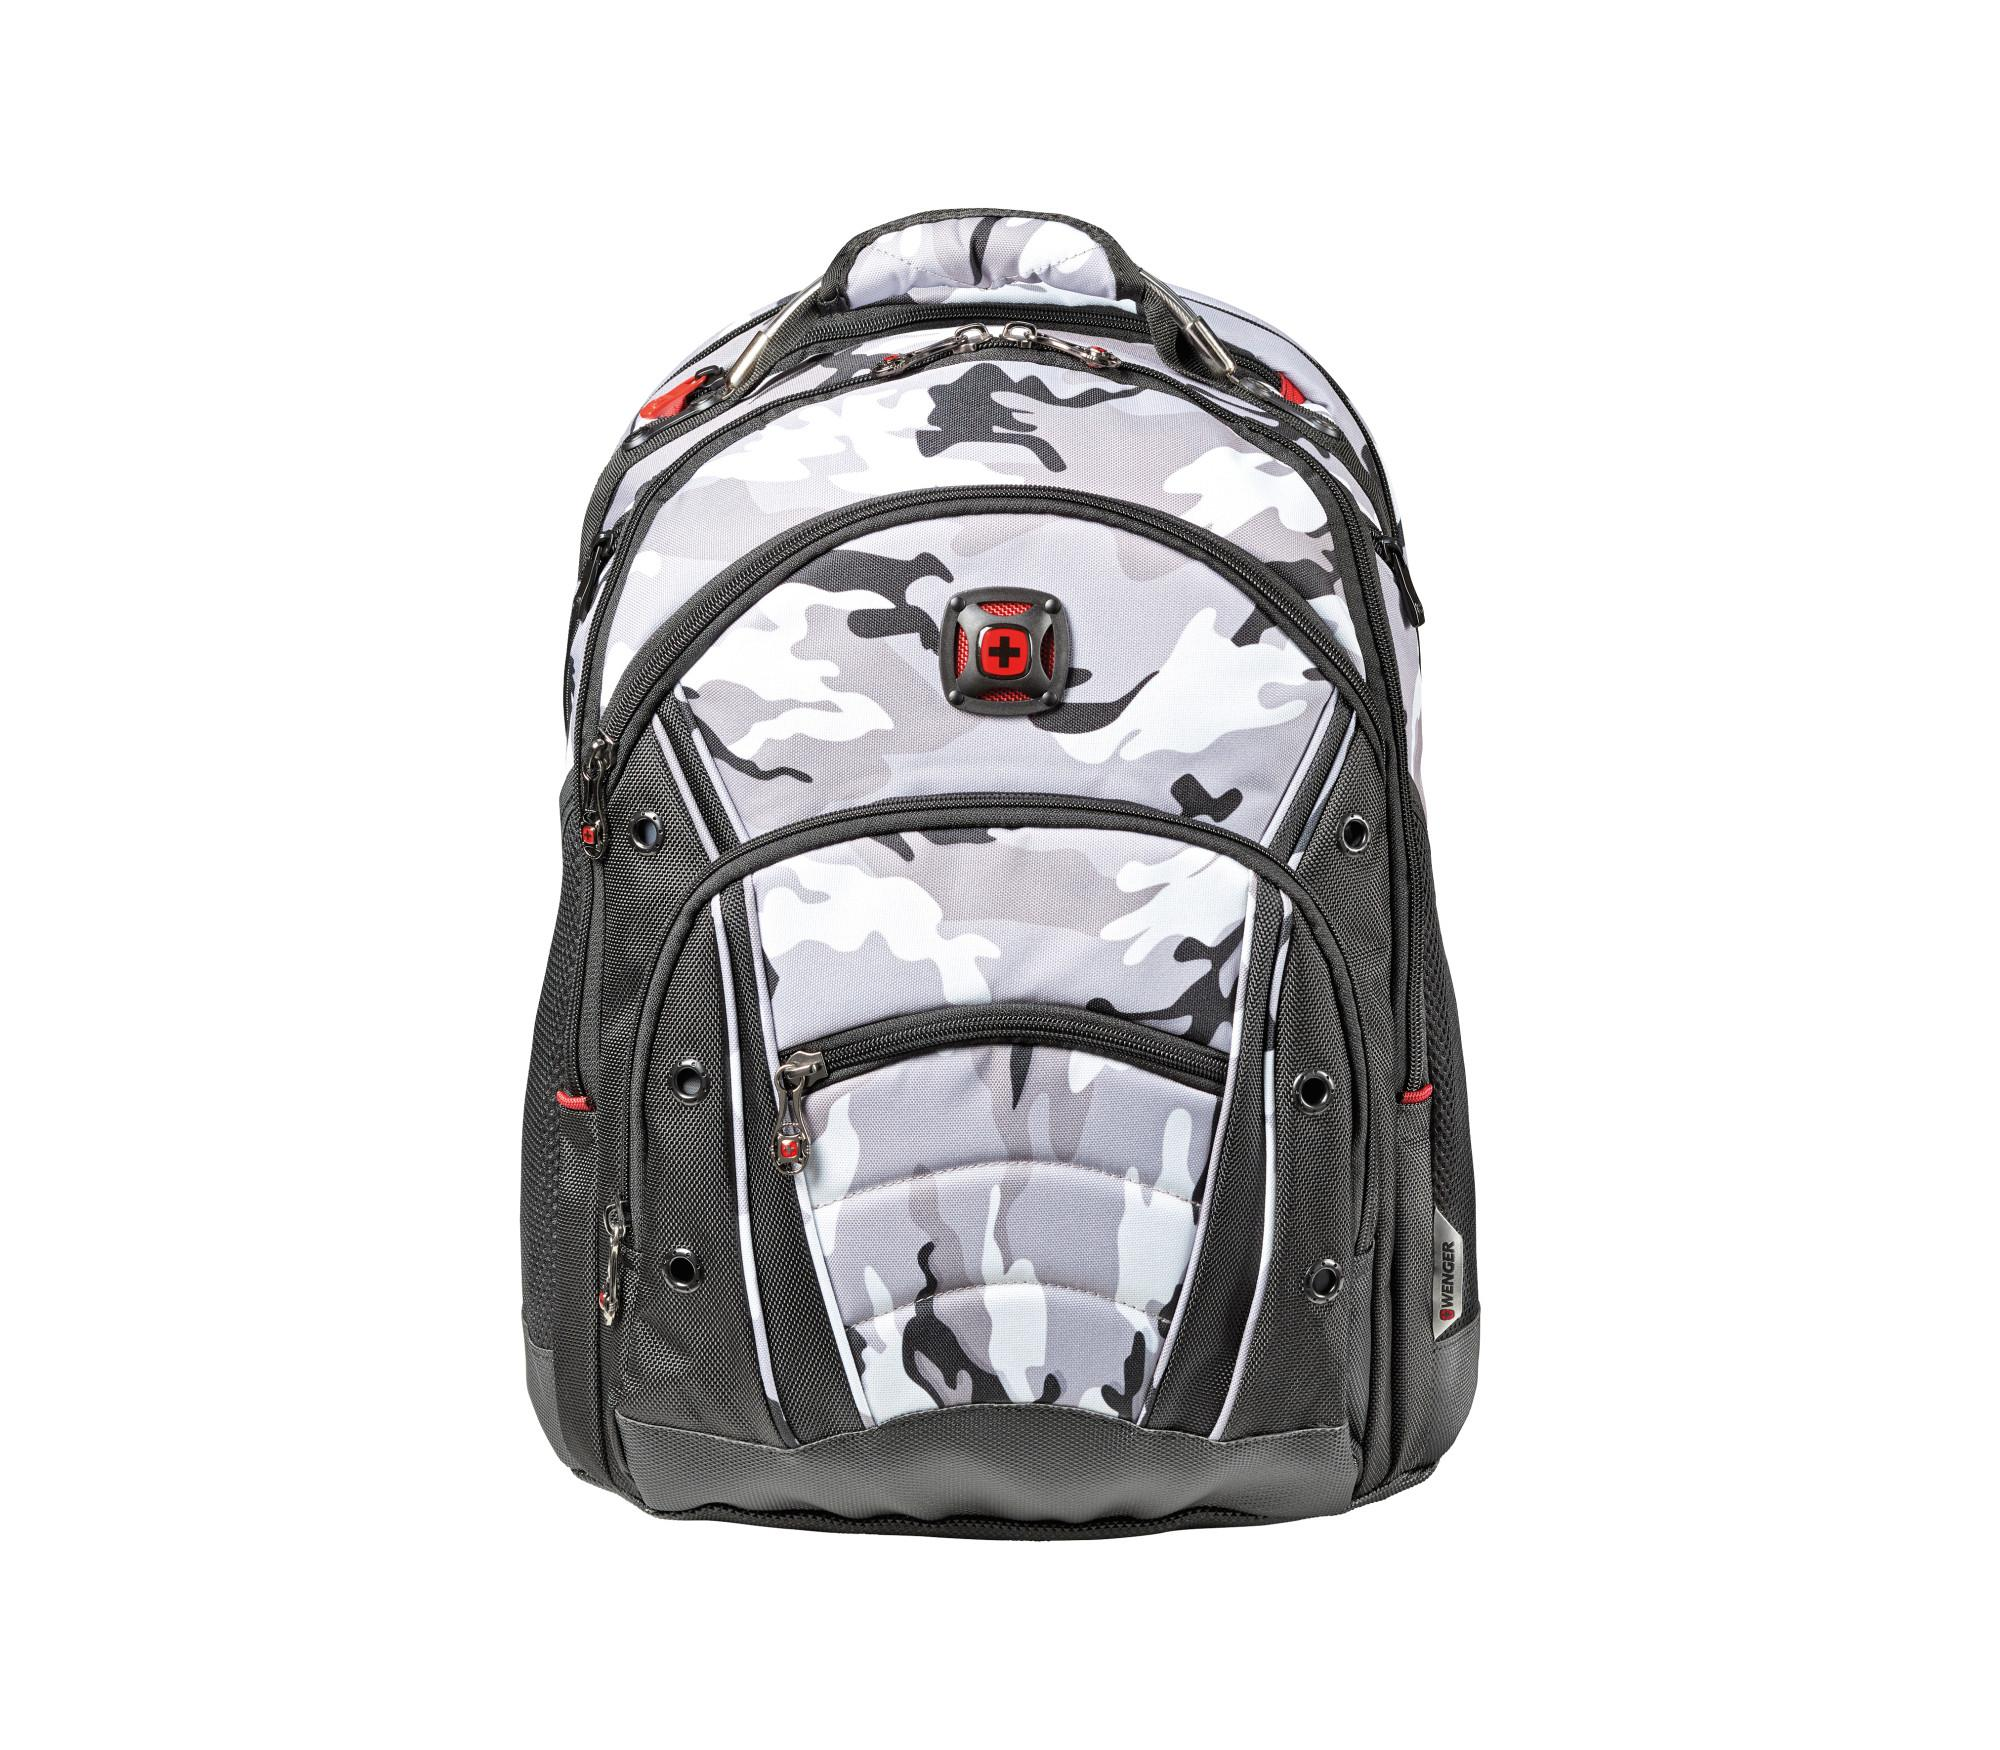 2fa0fda6f22 Wenger/SwissGear laptoptas Synergy 605036 kopen – Online Bestellen ...